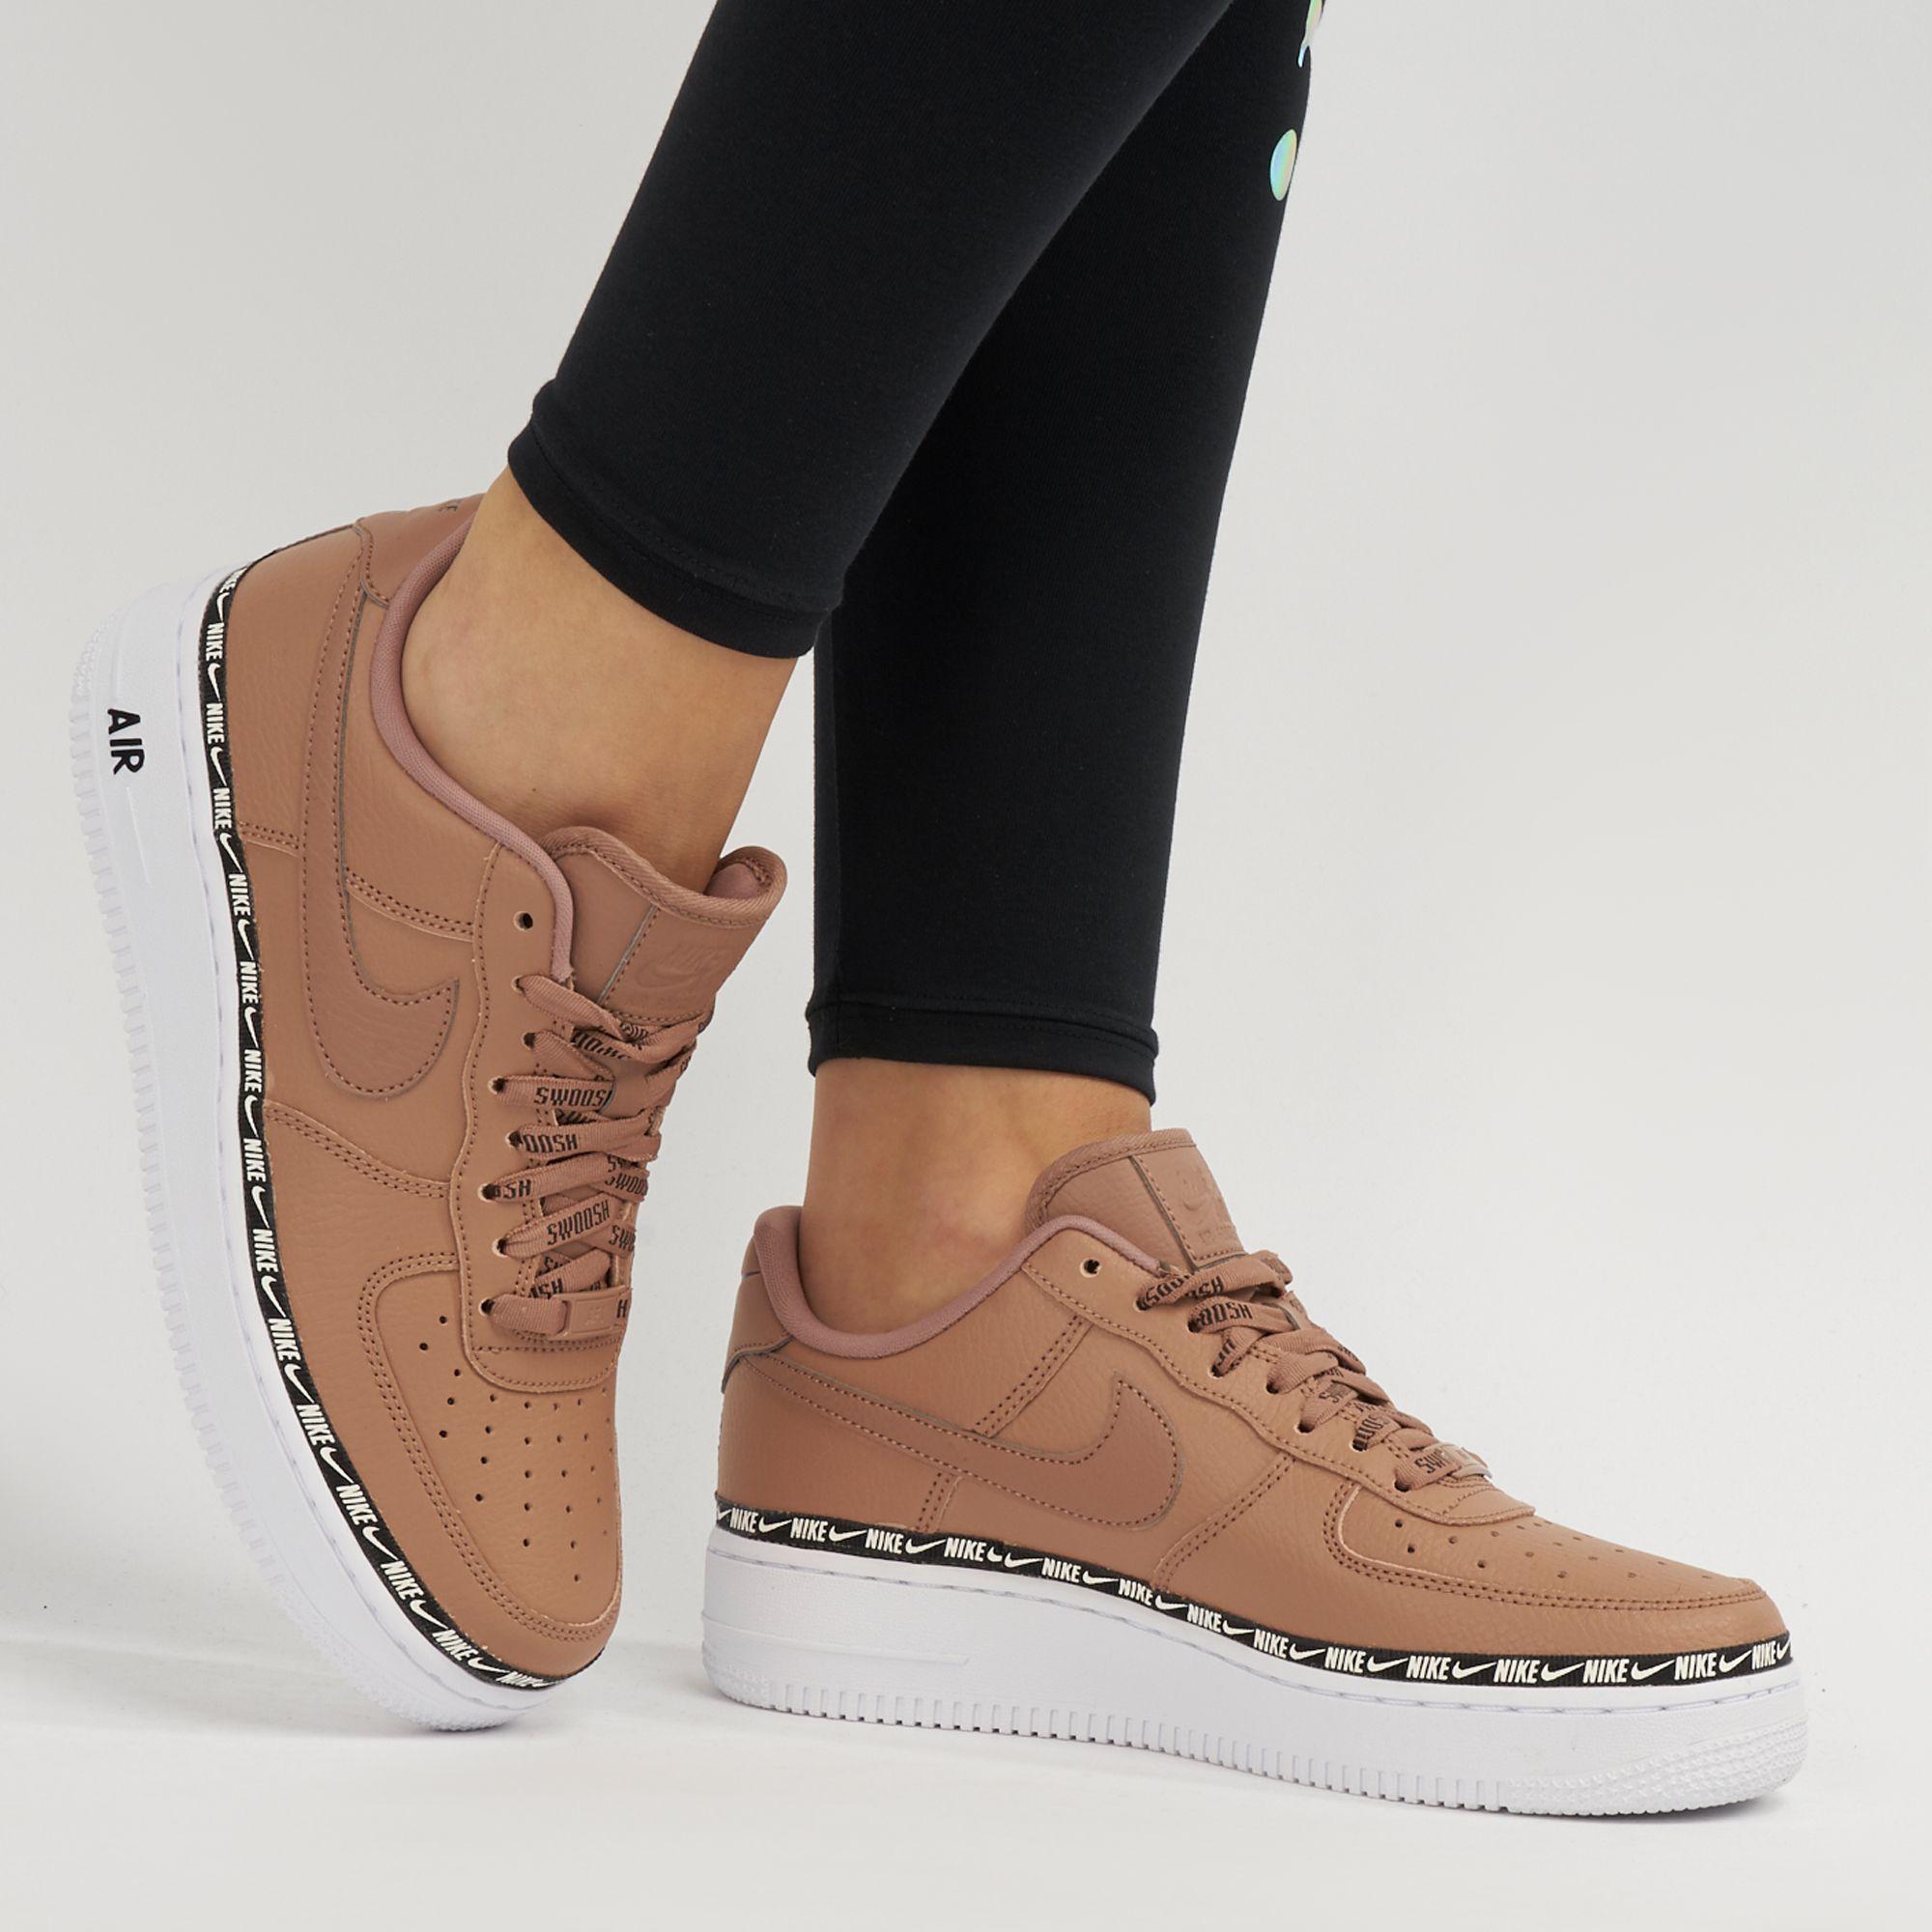 5c1e3037c8 Nike Air Force 1 07 SE Premium Shoe | Sneakers | Shoes | Sports ...